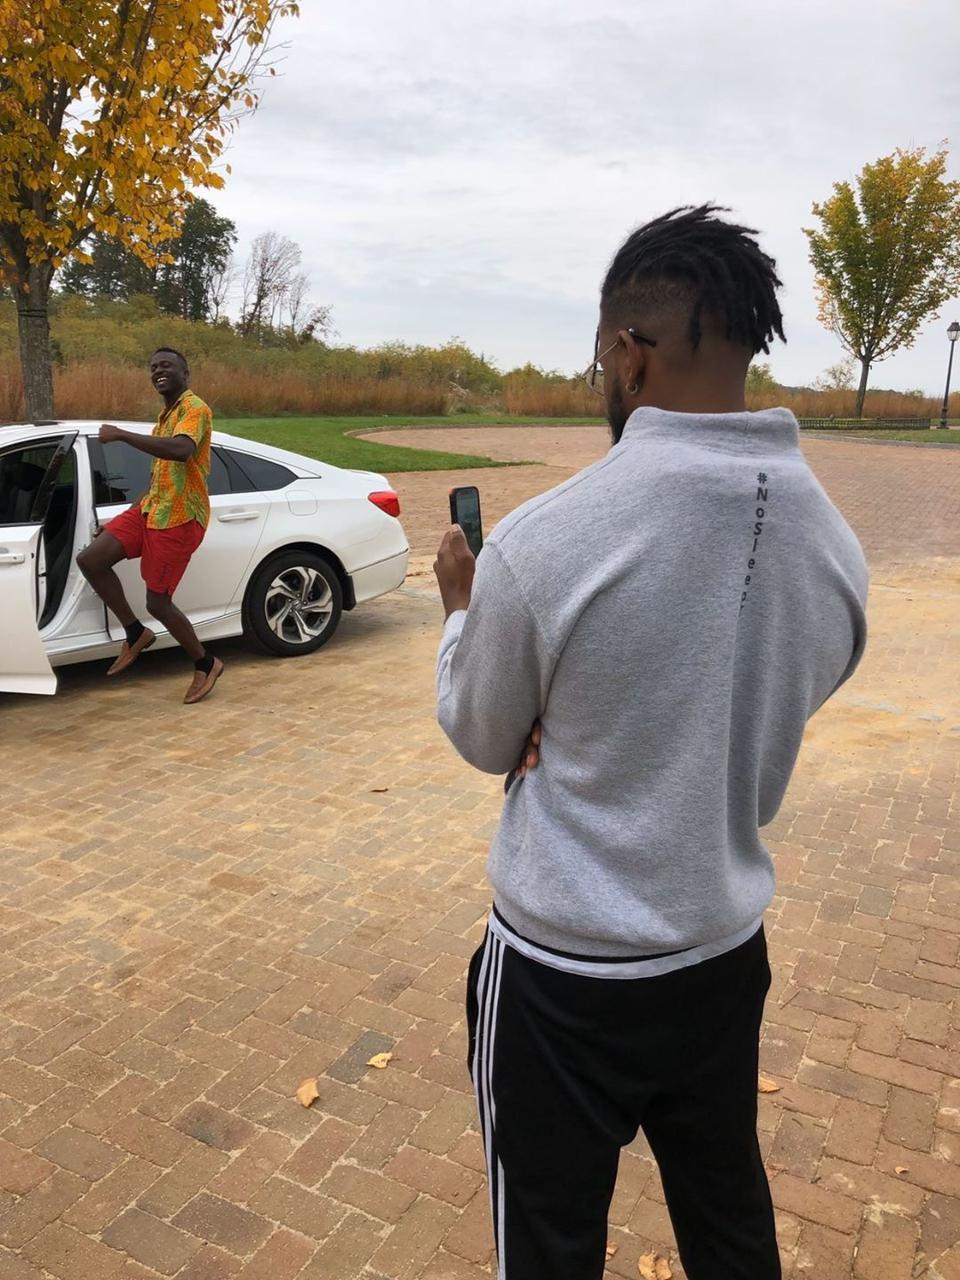 A man filming another man near a white car